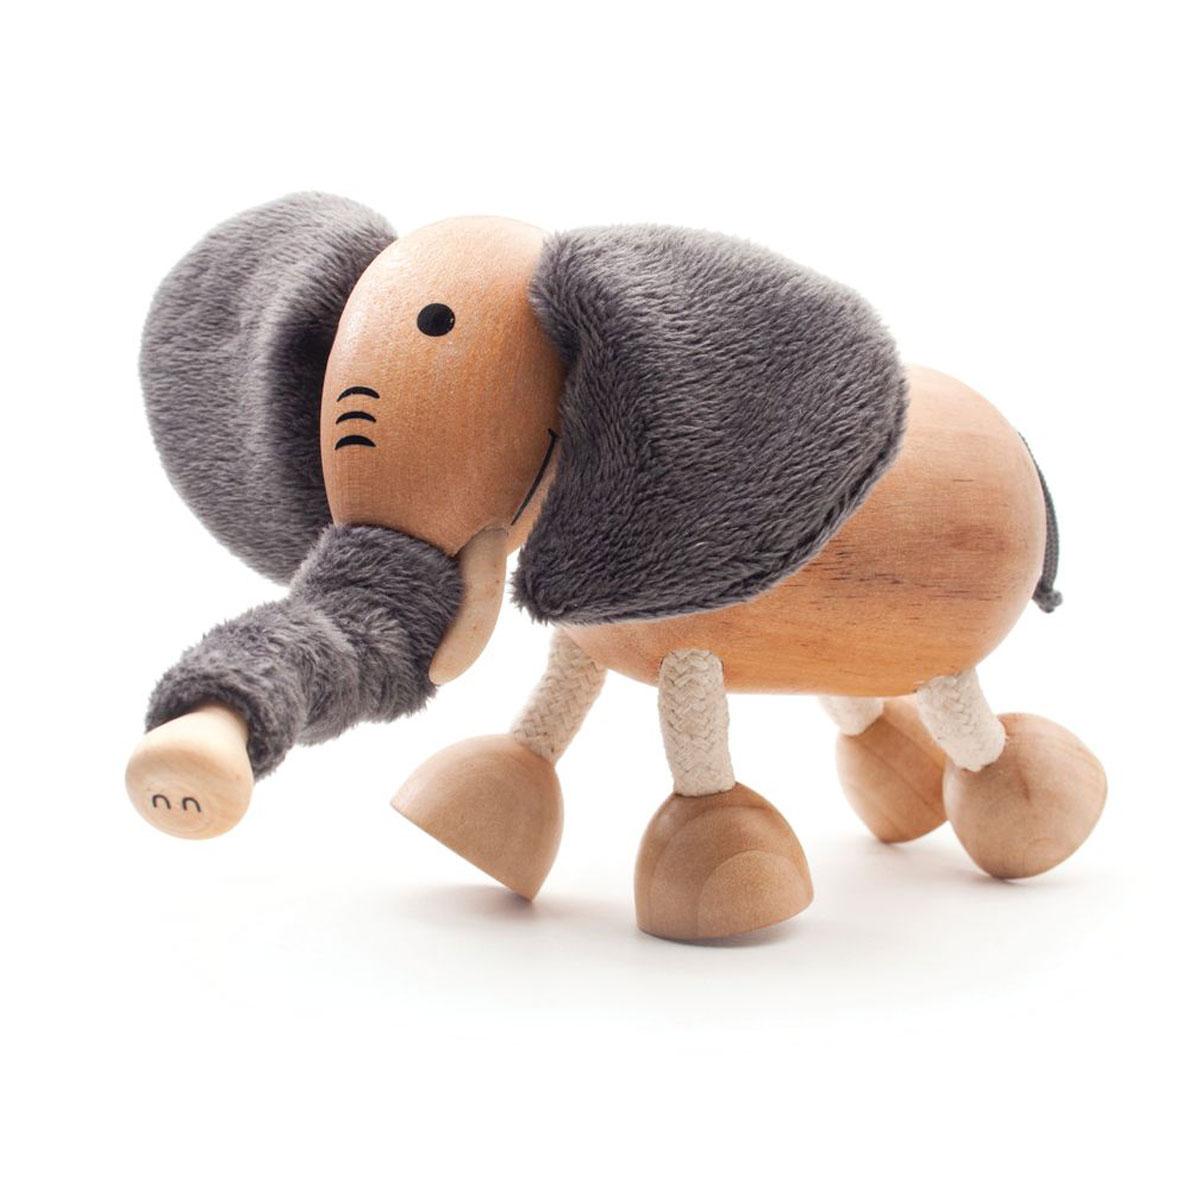 AnaMalz Фигурка деревянная Слоненок фигурки игрушки anamalz касатик